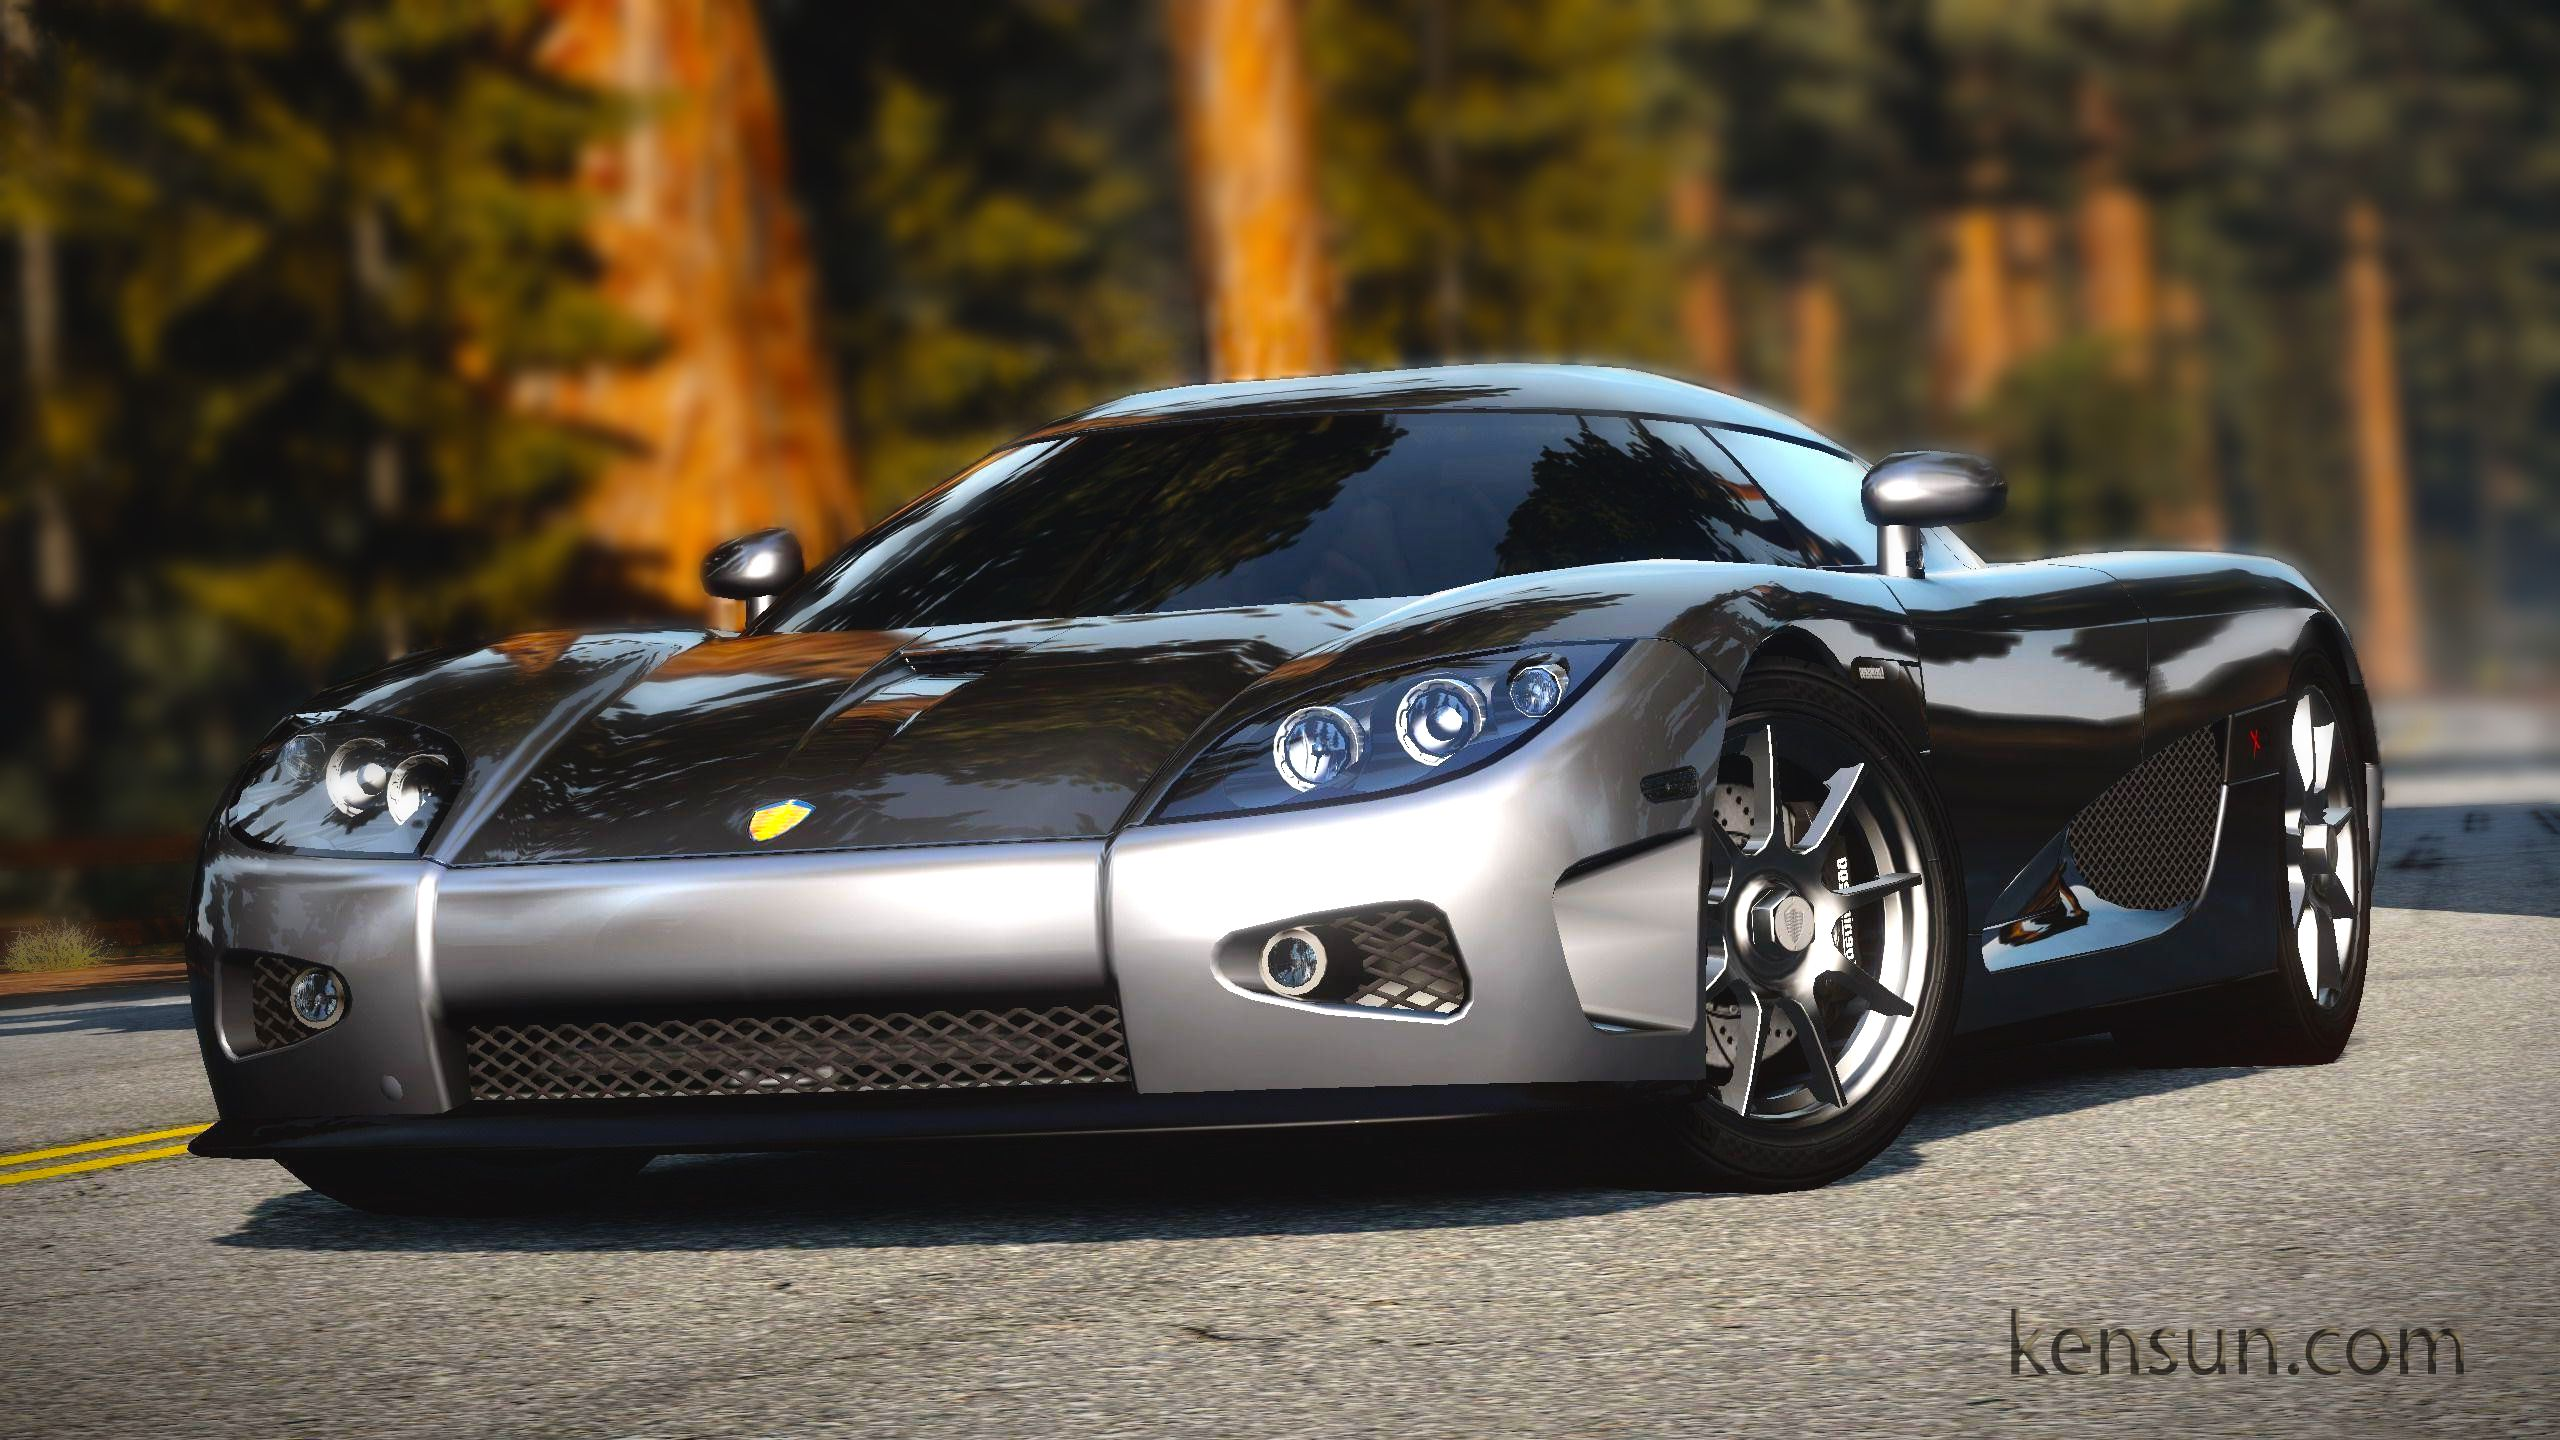 Koenigsegg Ccxr Trevita >> 2009 Koenigsegg Ccxr Trevita Estimate Value Or Price 4 8 Million